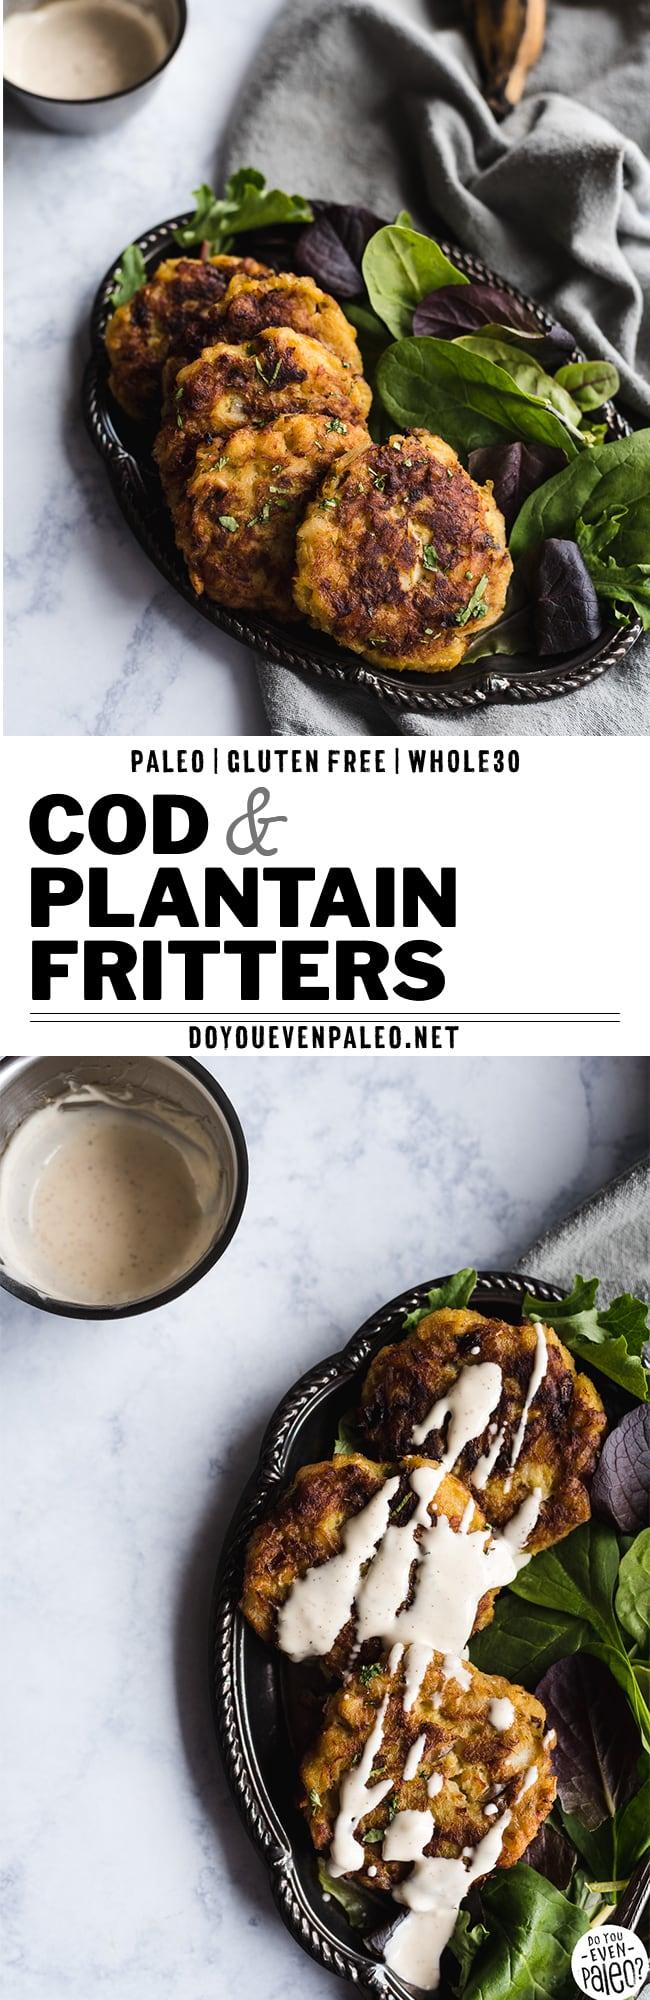 Paleo Cod & Plantain Fritters Recipe | DoYouEvenPaleo.net